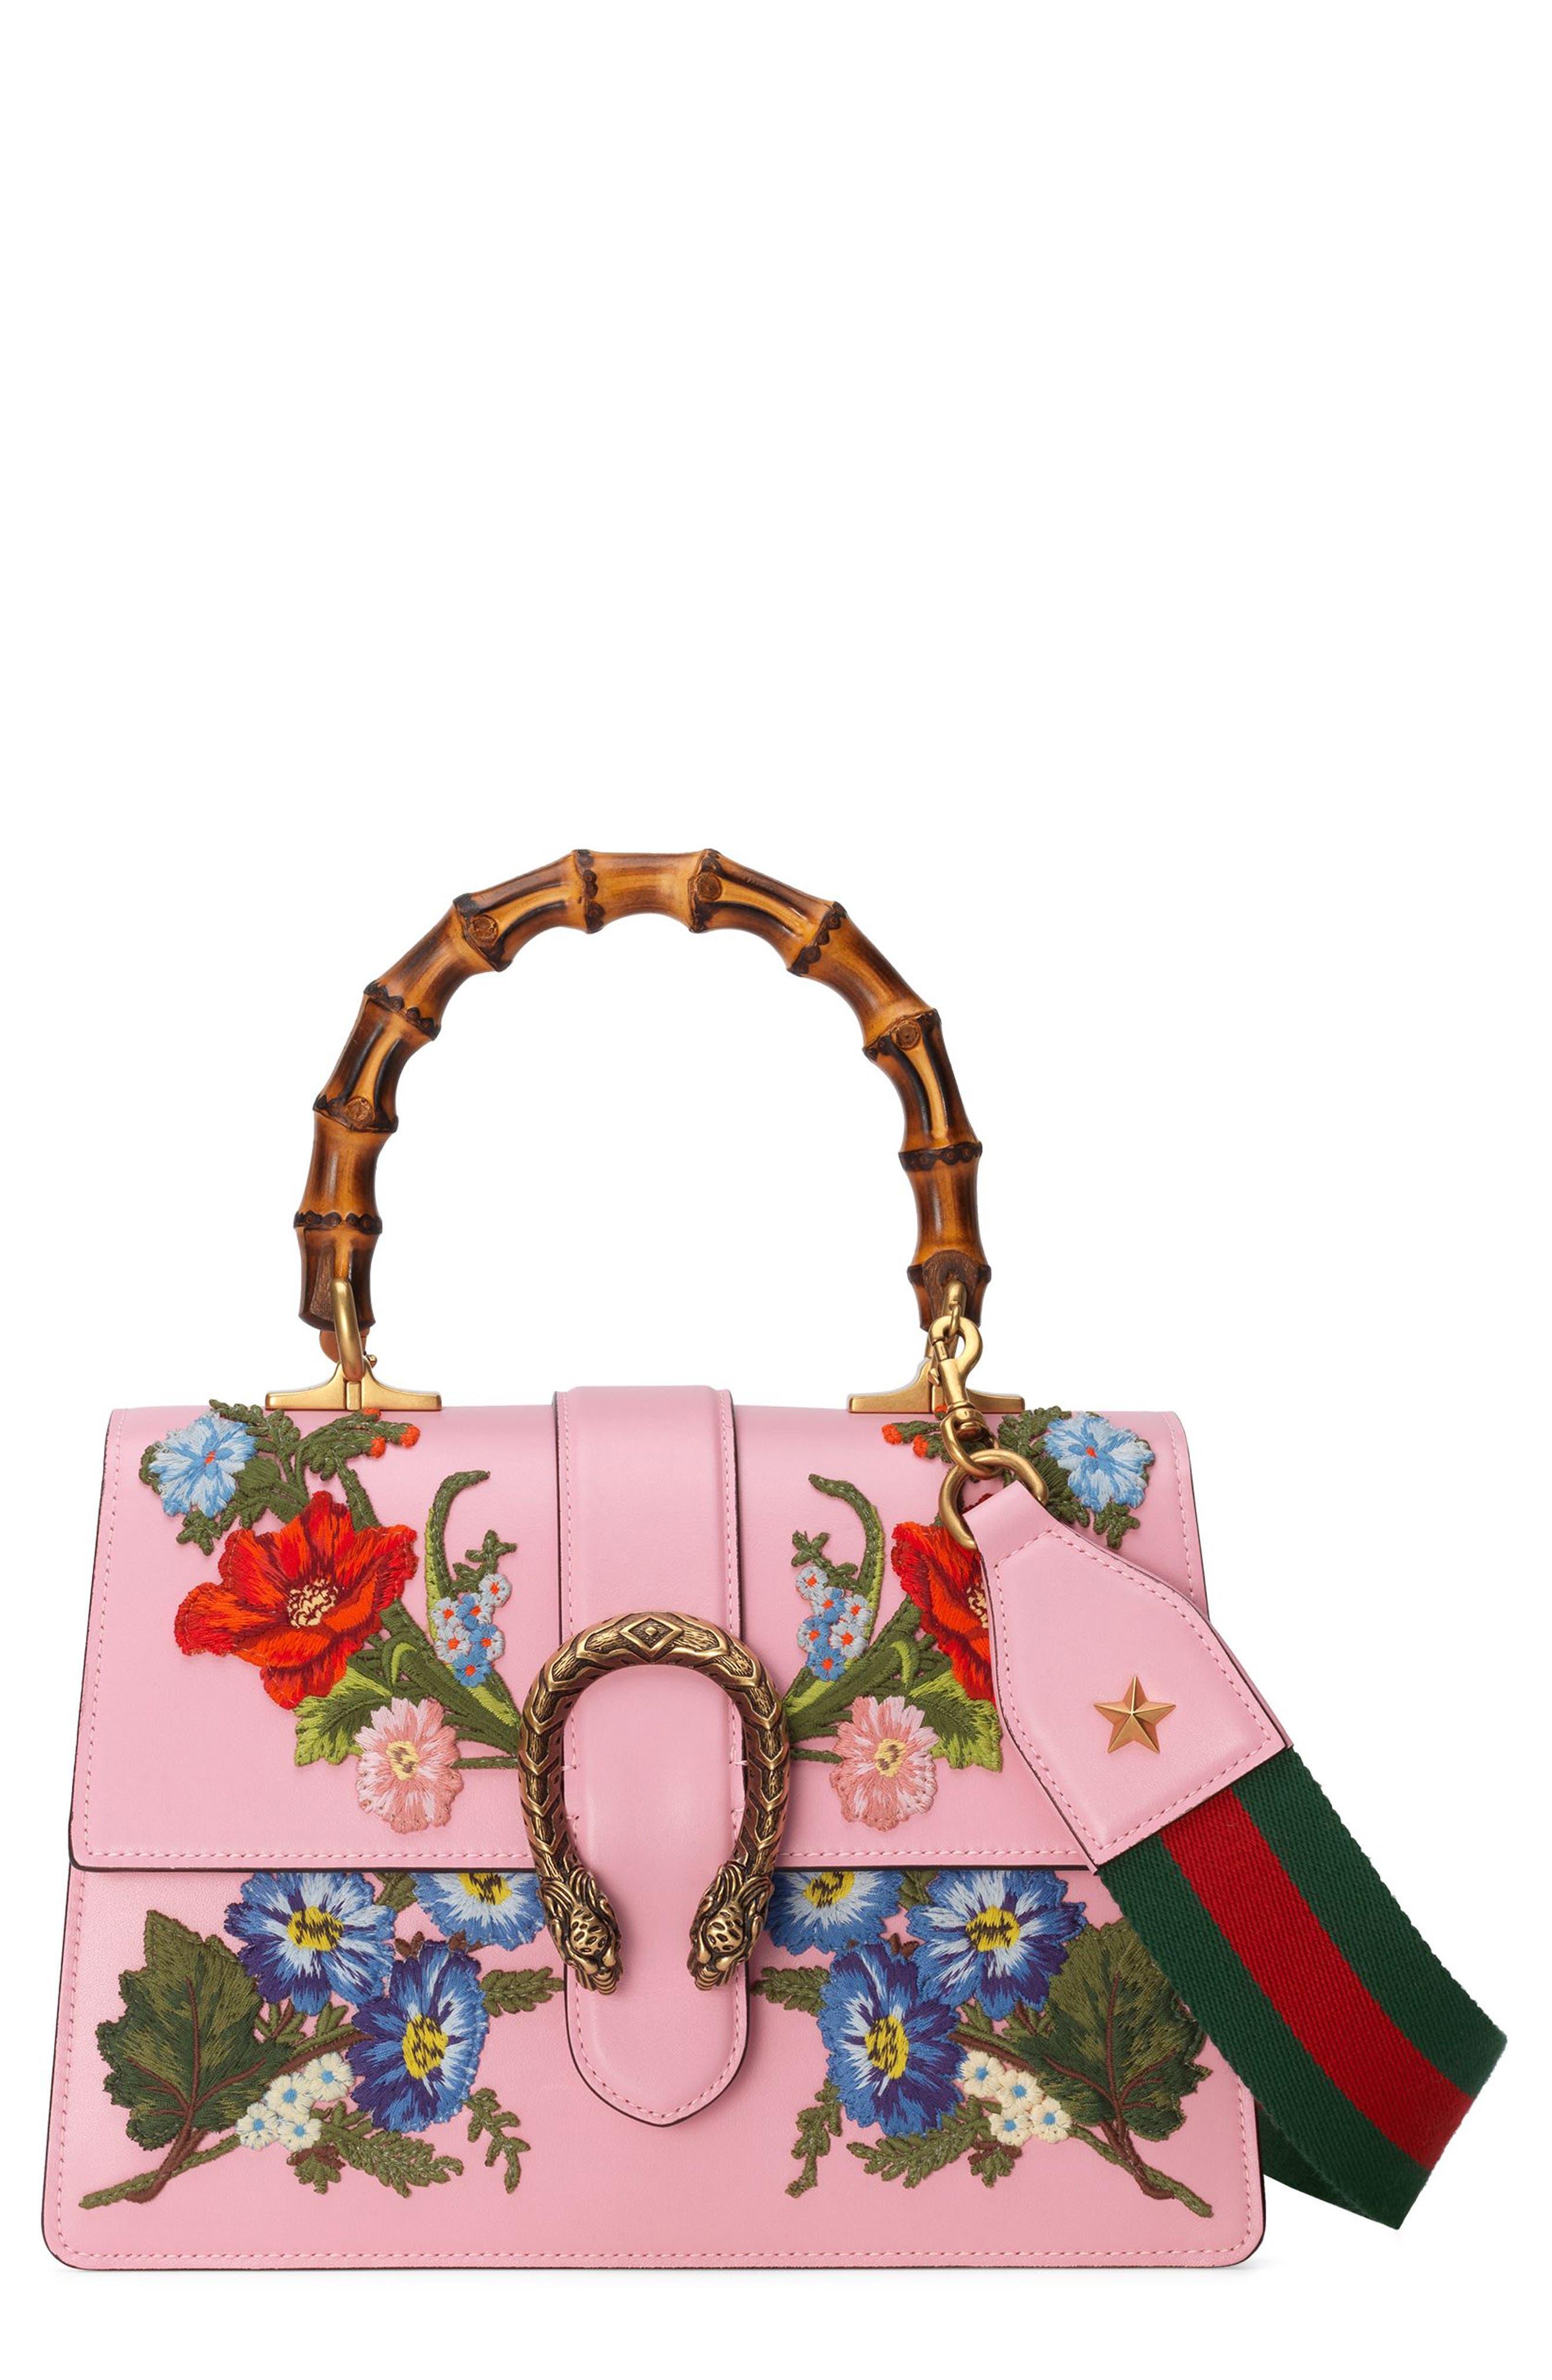 Small Dionysus Top Handle Leather Shoulder Bag,                             Main thumbnail 1, color,                             Sugar Pink/Multi